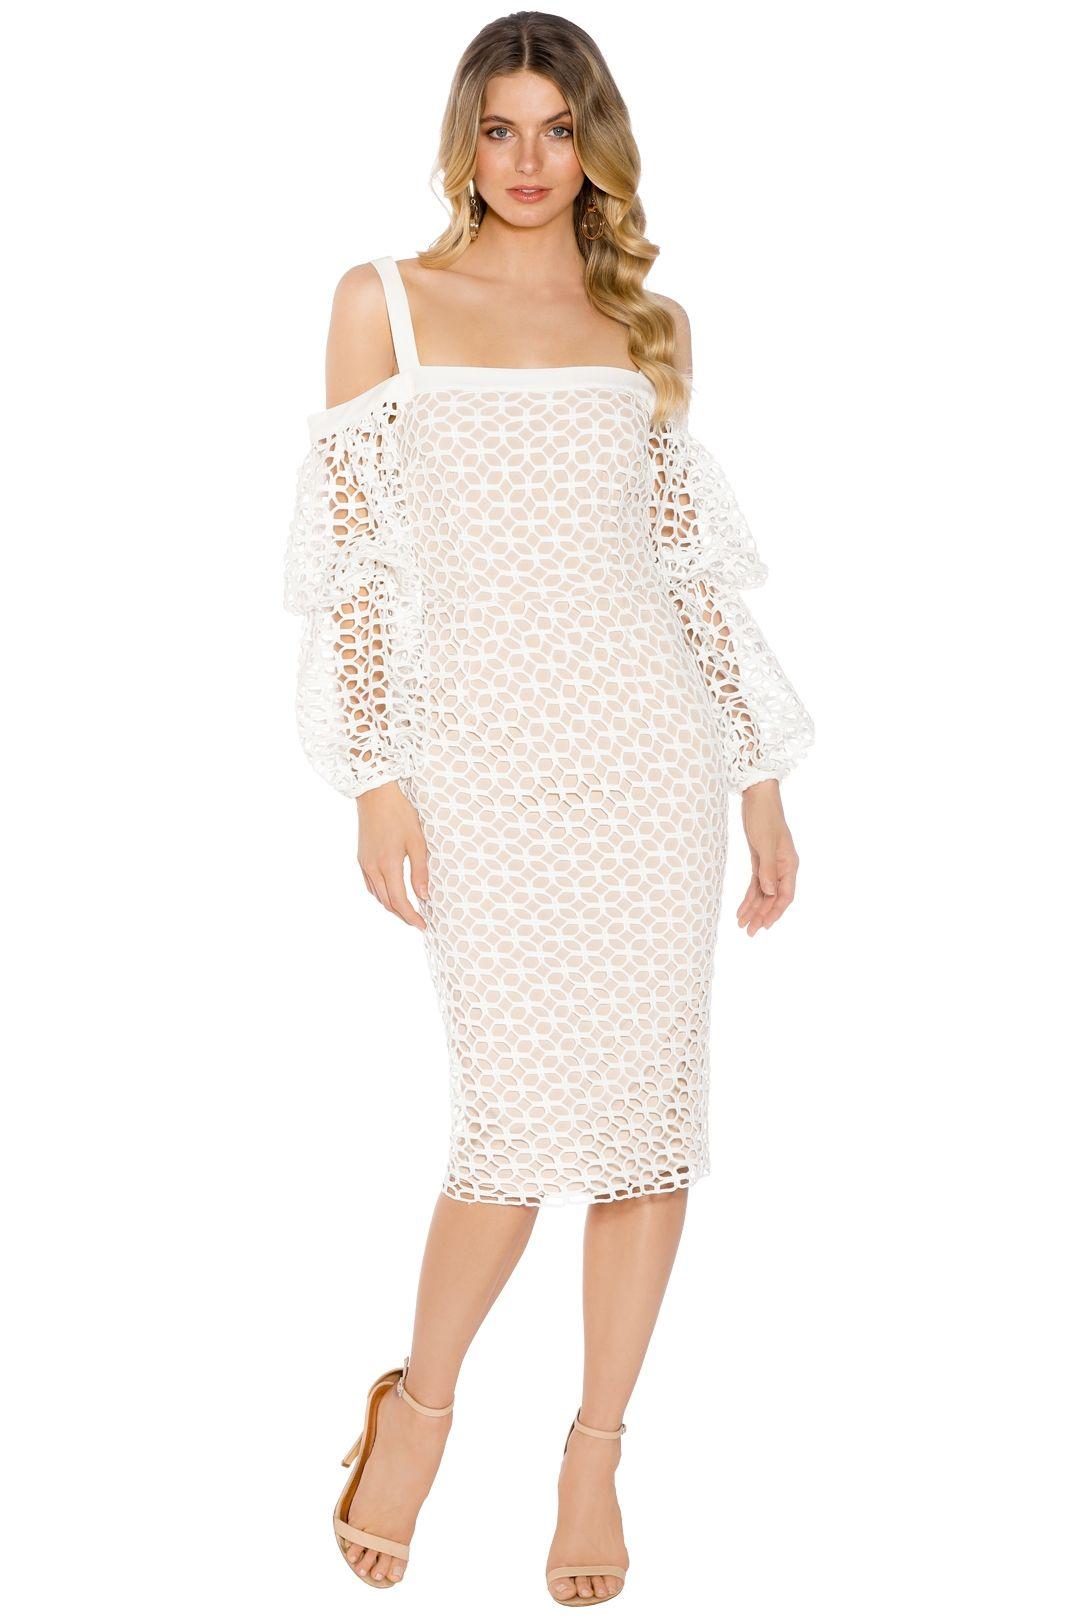 Cooper St - Karlie Lace Bloom Dress - White - Front